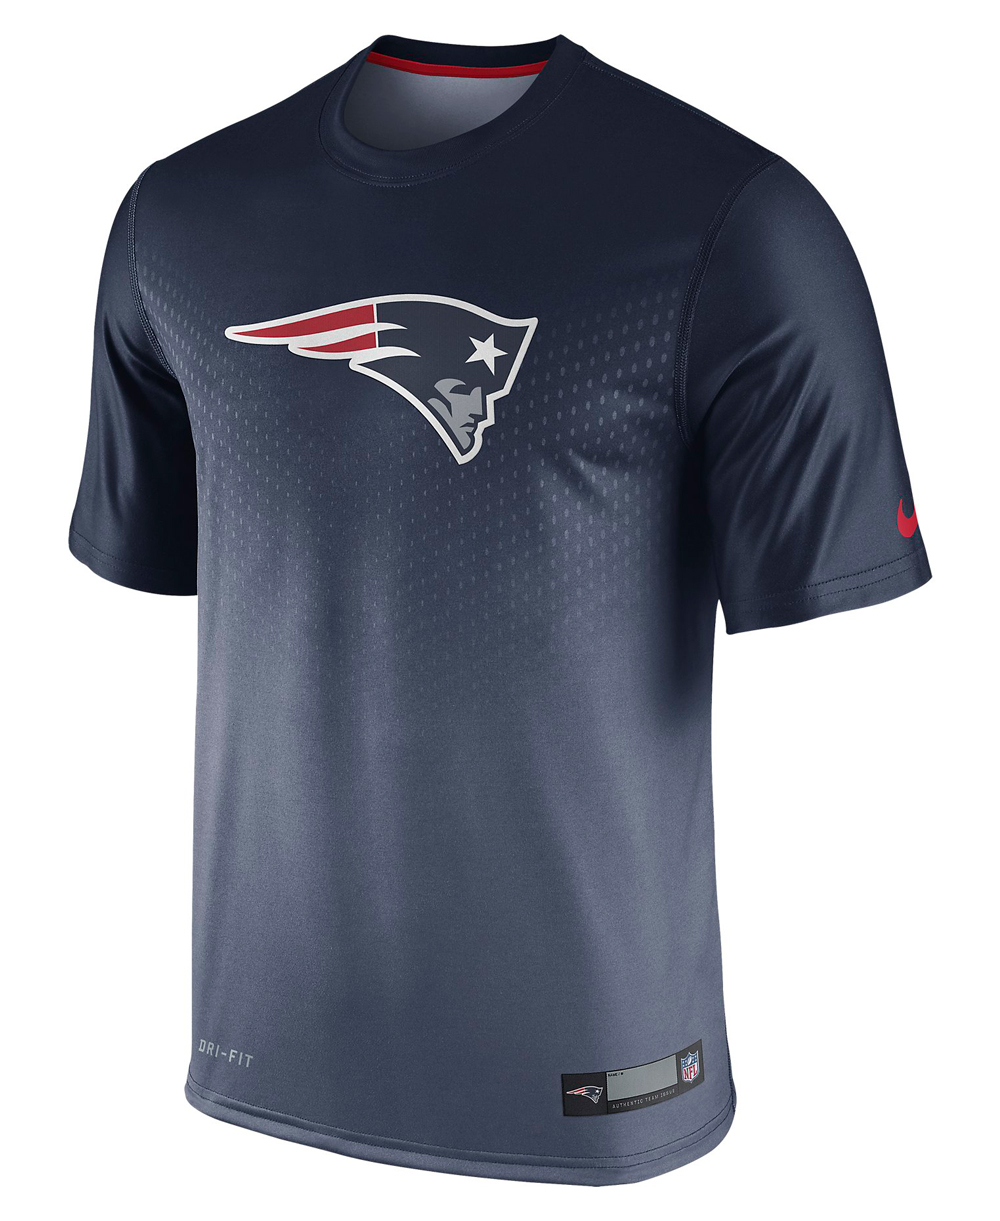 Herren Kurzarm T-Shirt Legend Sideline NFL New England Patriots